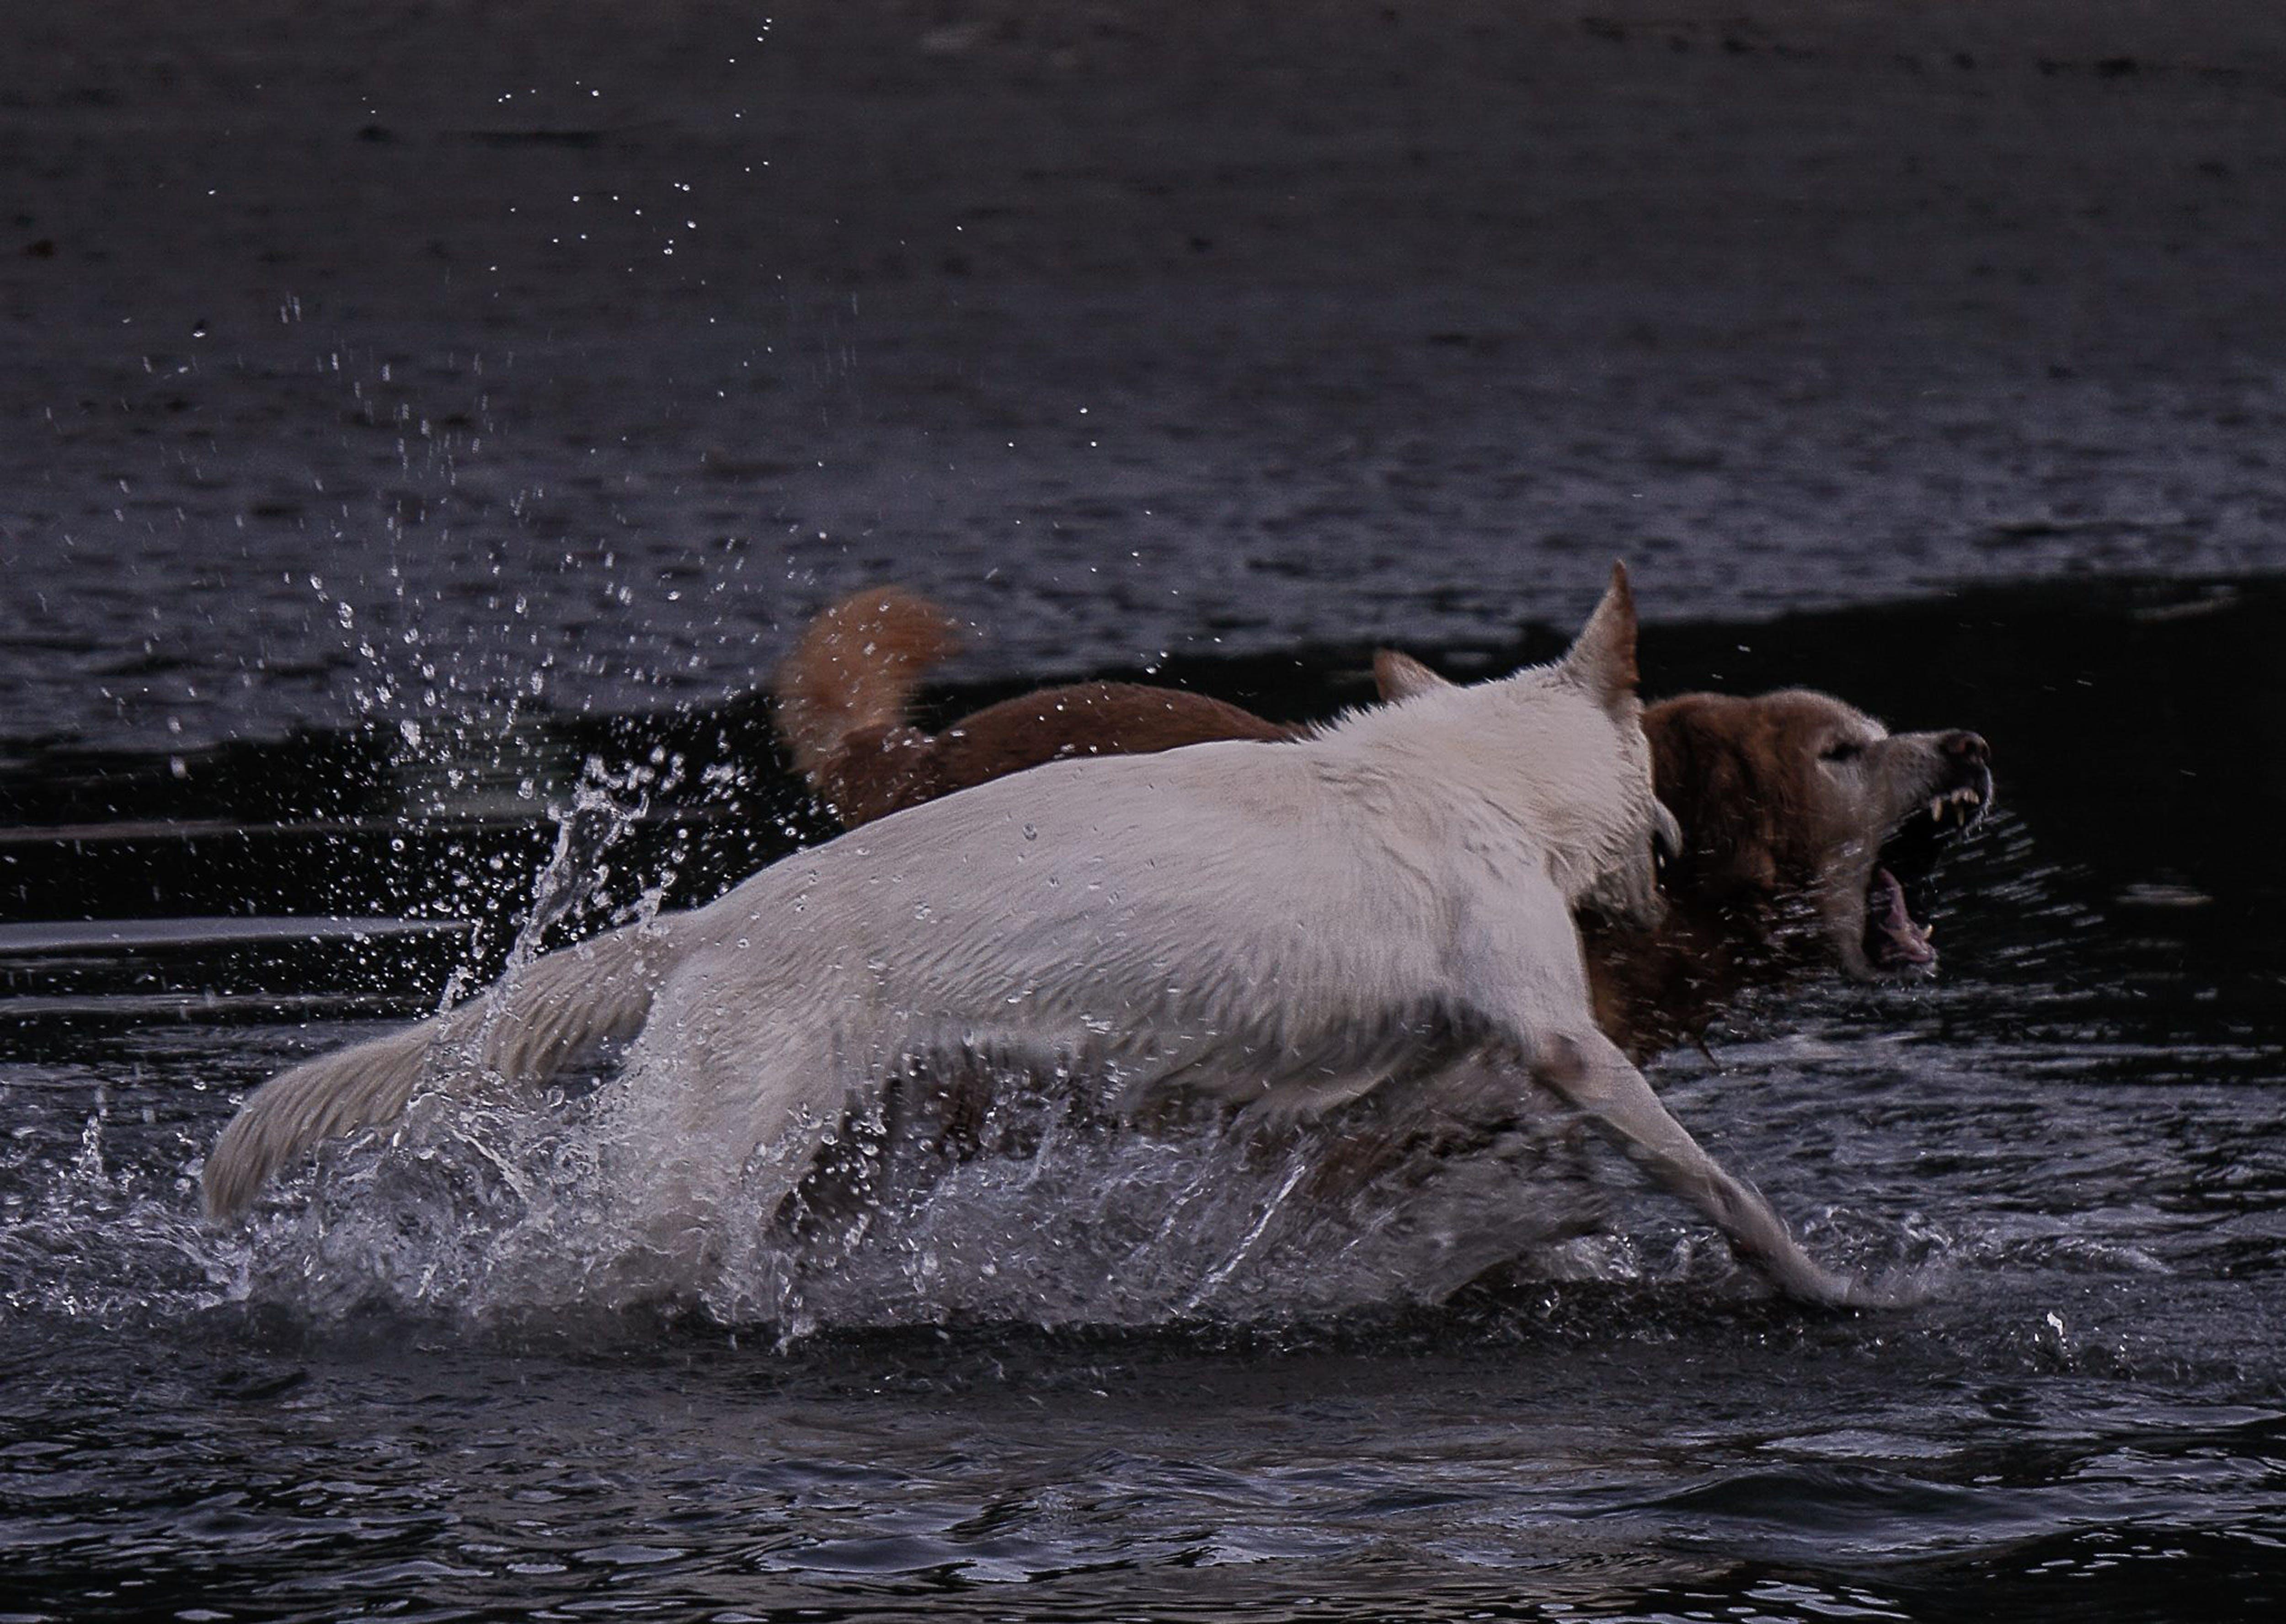 Kostenloses Stock Foto zu haustier, haustier hund, hunde, kampf